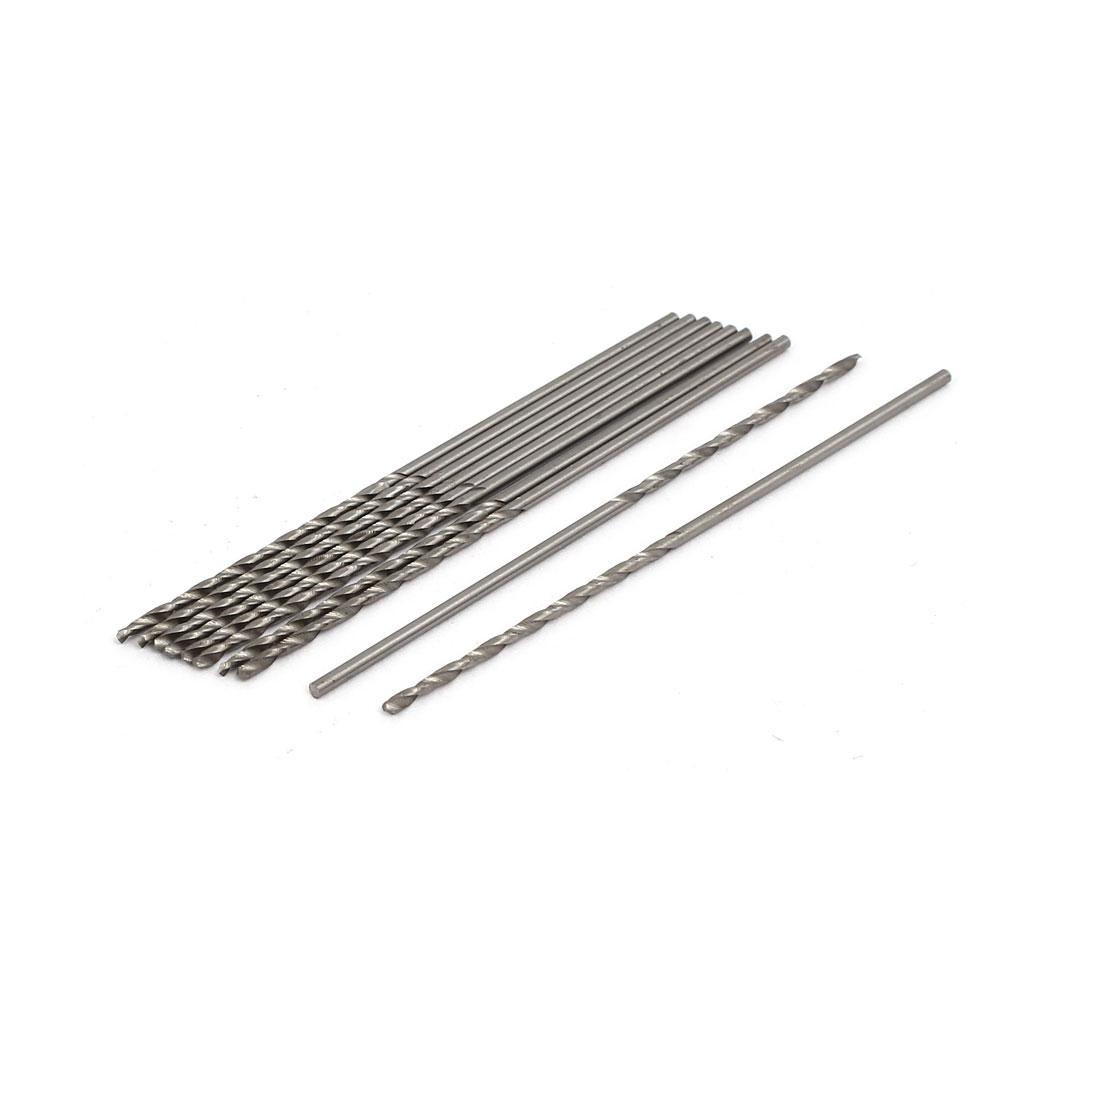 1.4mm Dia HSS Double Flutes Straight Shank Twist Drill Bits Silver Tone 10pcs